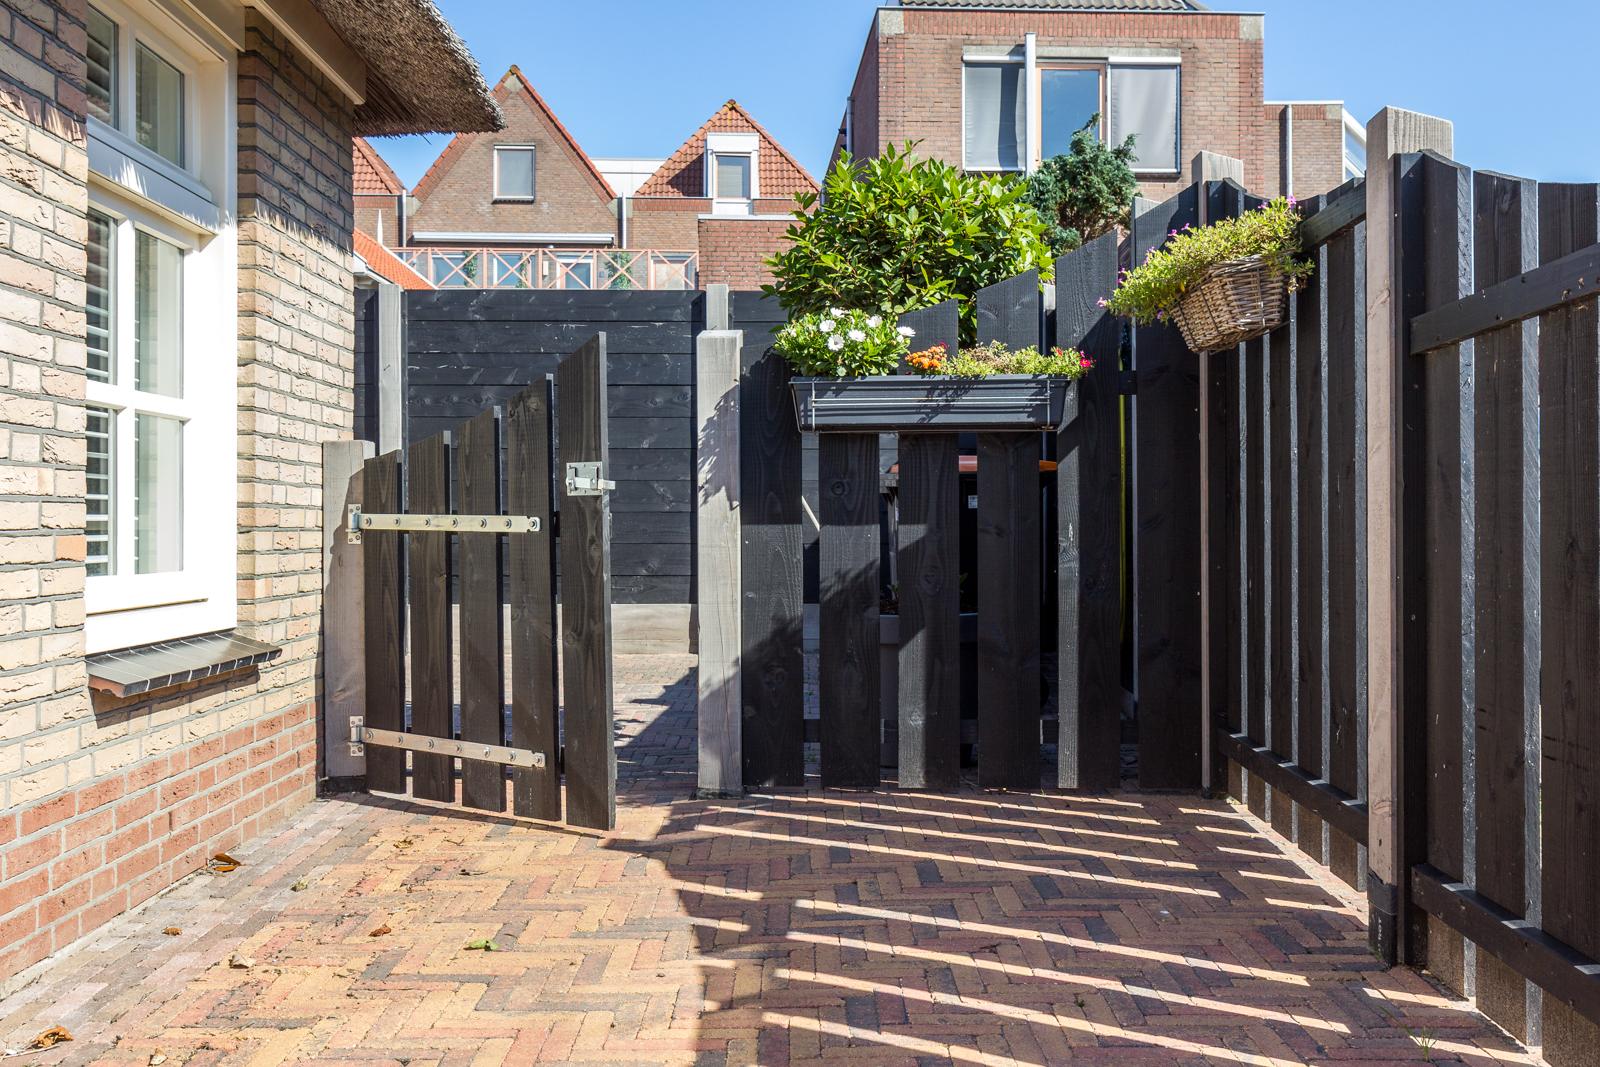 Omheining-tuin-Den-Oever-5281